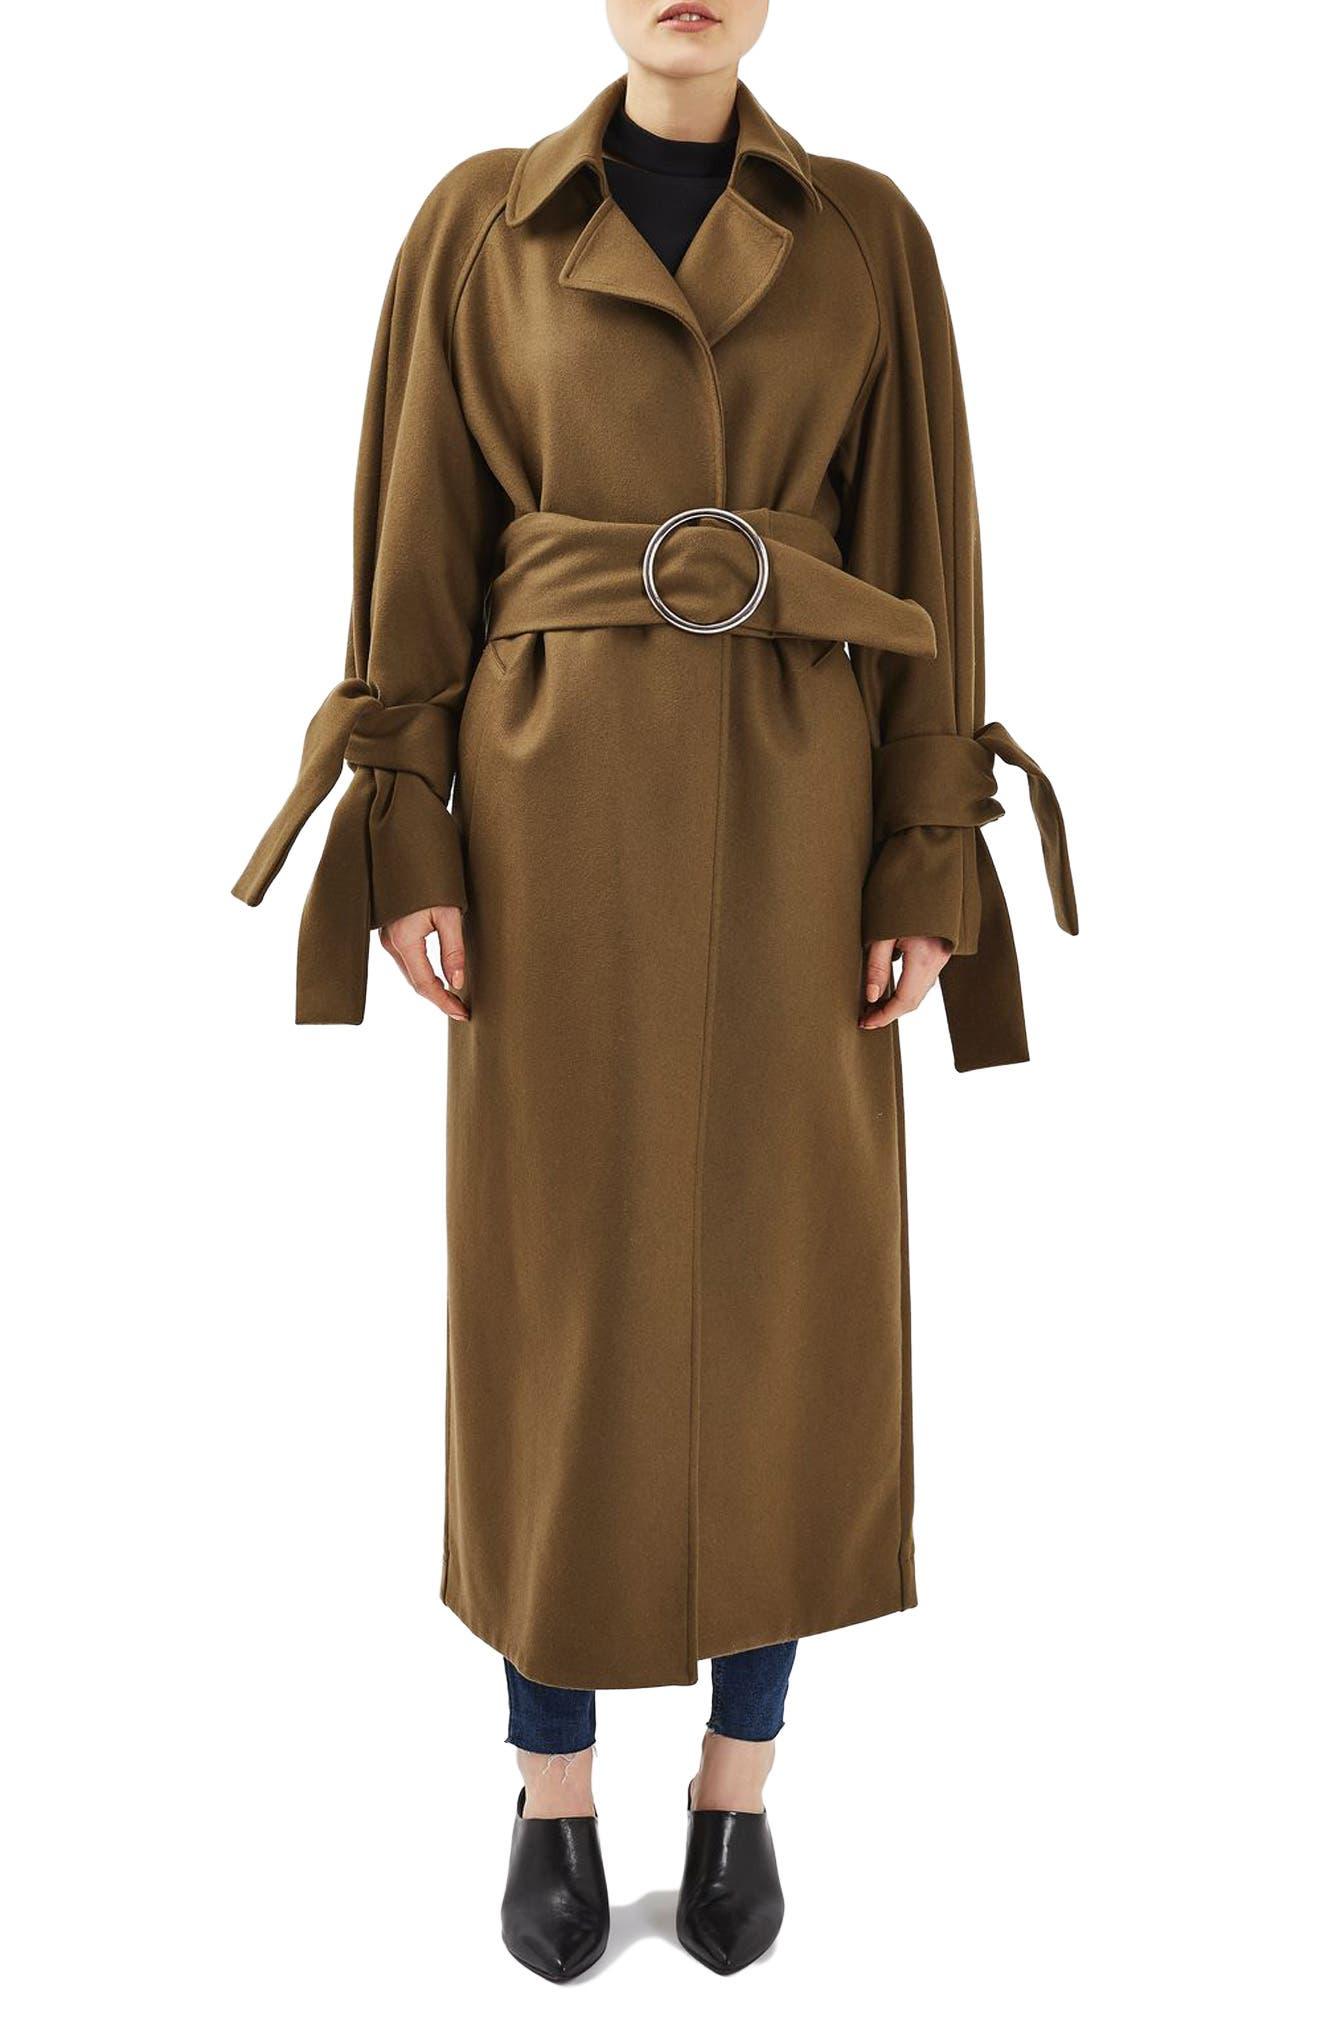 Alternate Image 1 Selected - Topshop Boutique Tie Sleeve Wool Coat